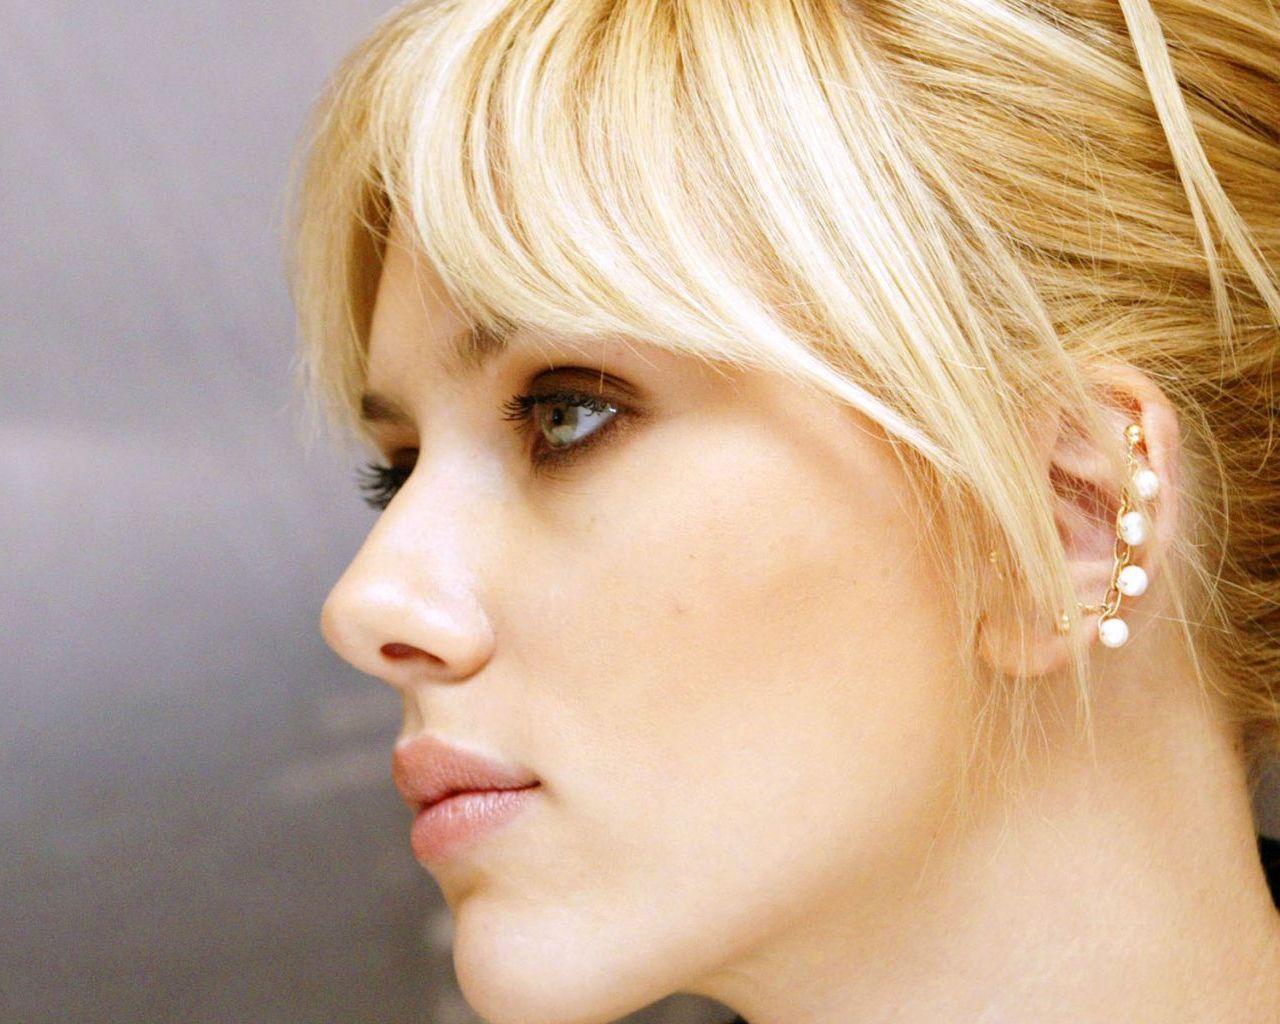 Grthitz scarlett johansson - Scarlett johansson blogspot ...